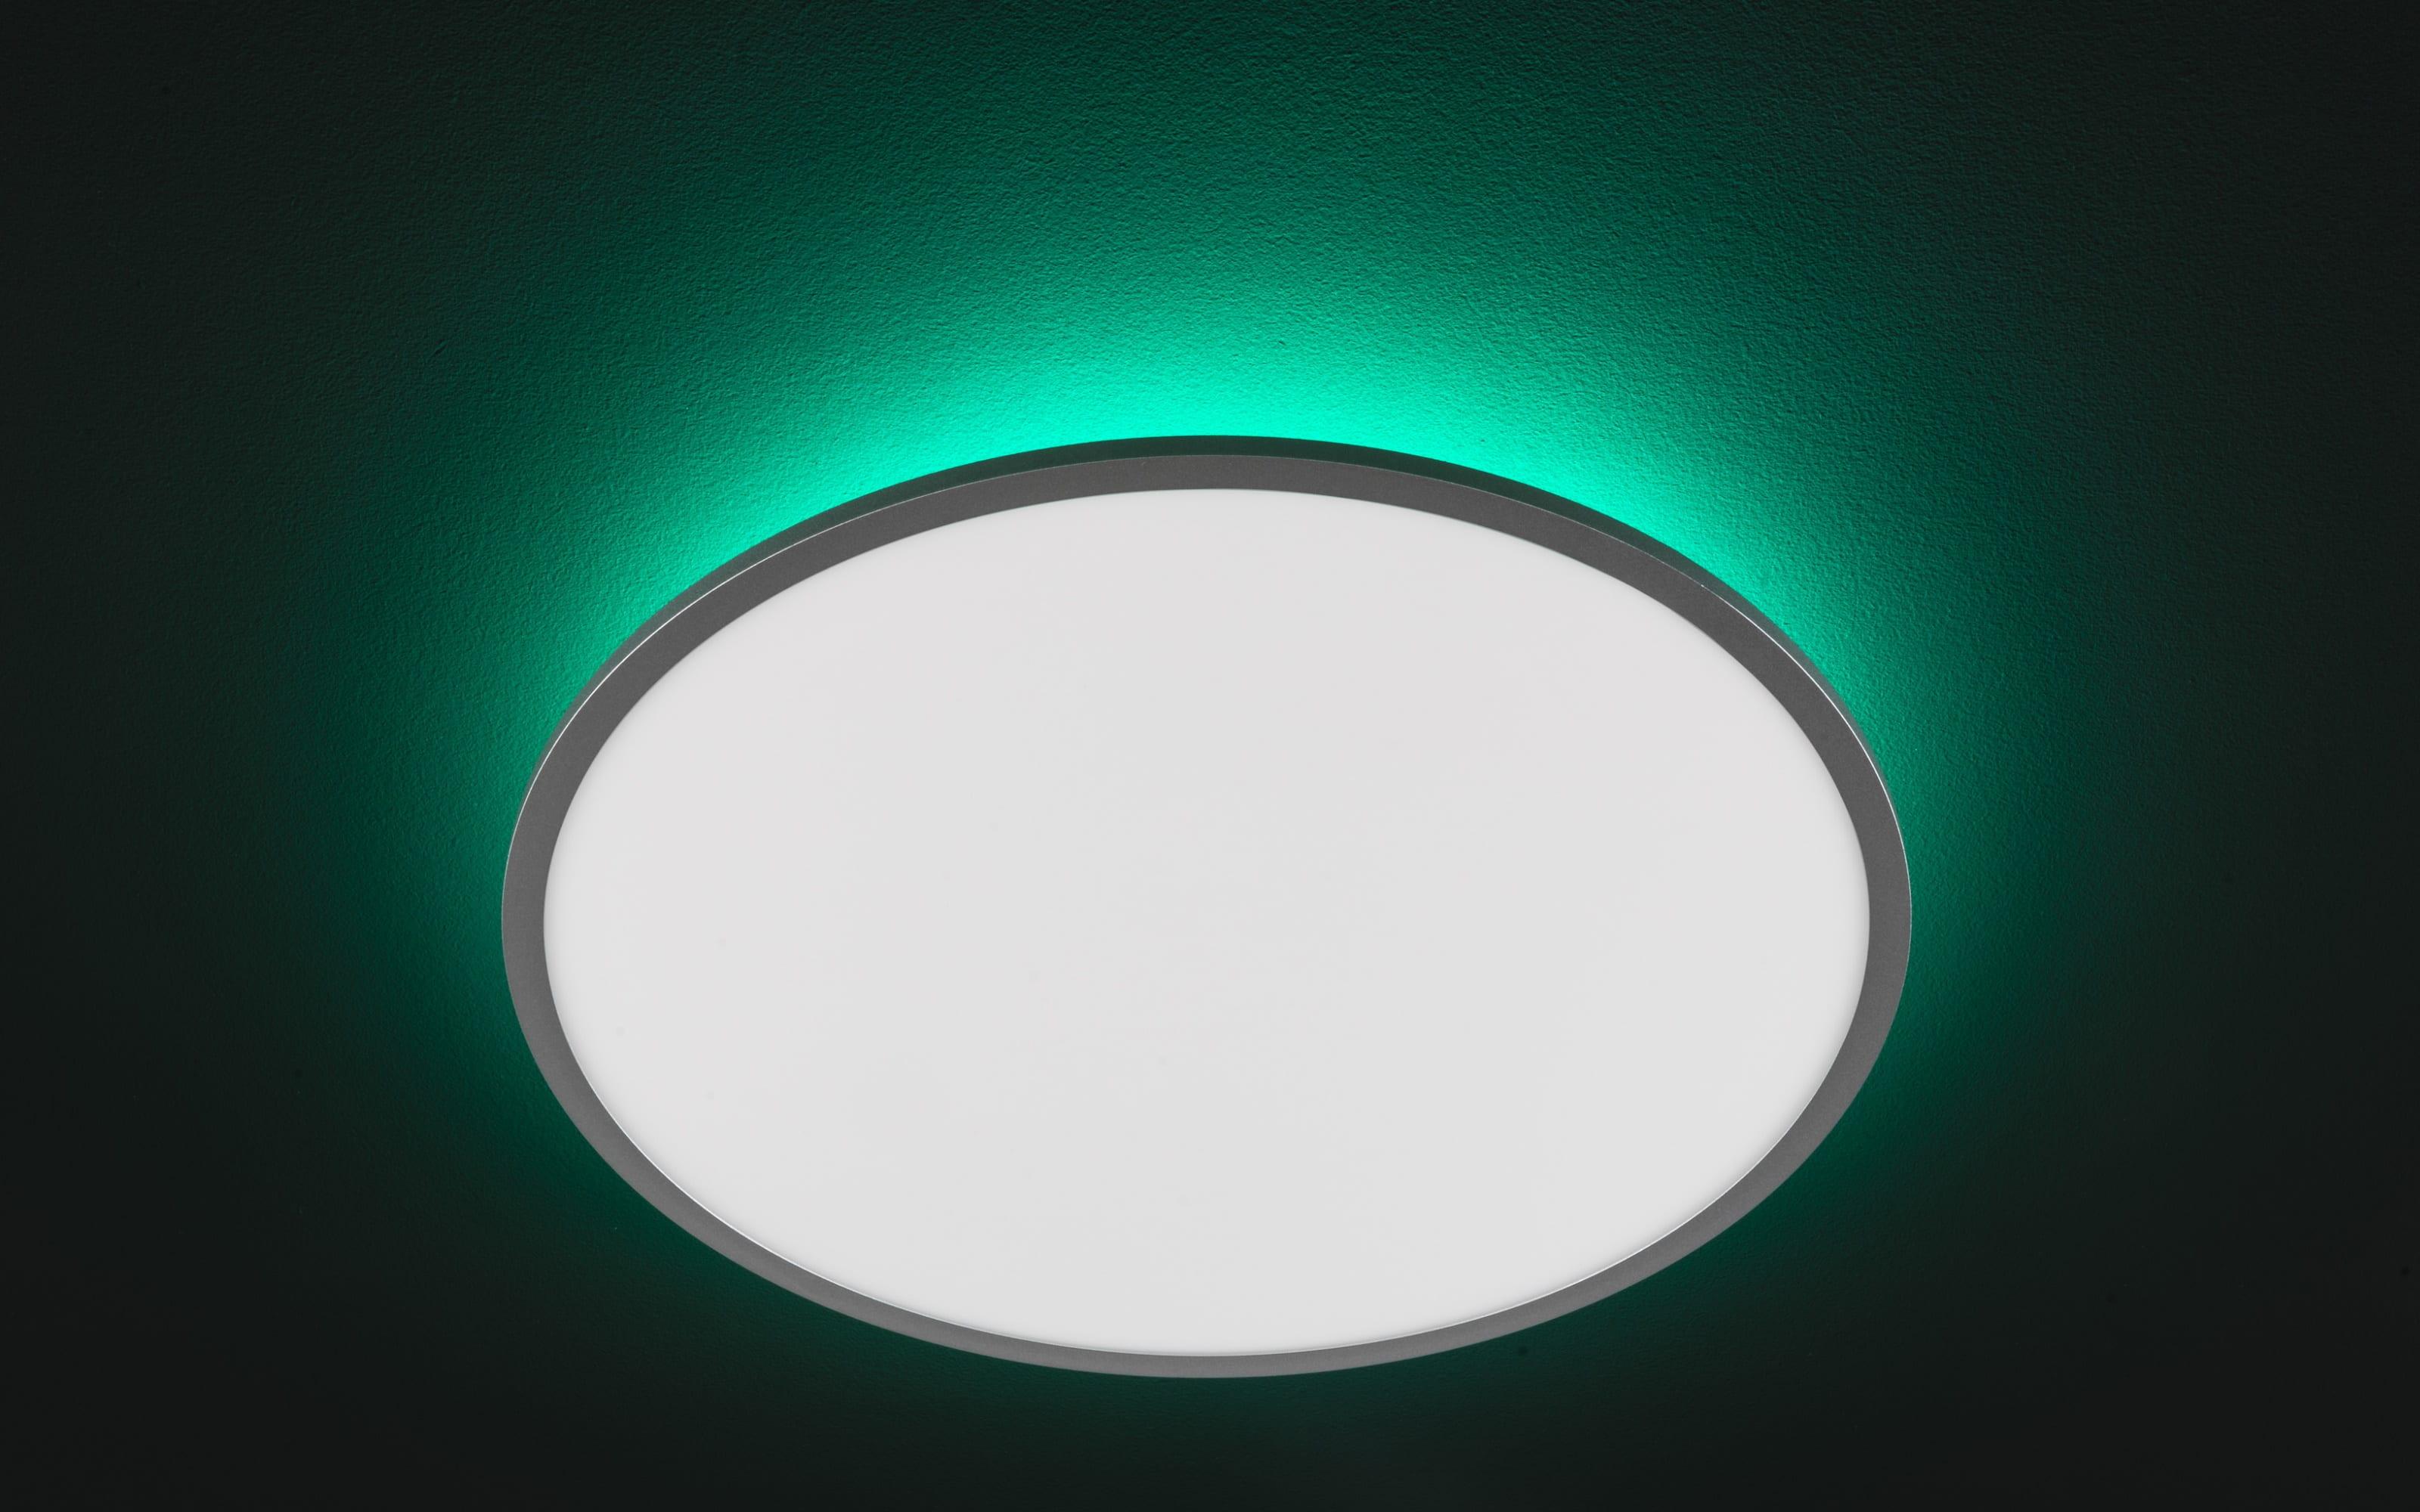 LED-Deckenleuchte Linox CCT RGB in silberfarbig/weiß, 60 cm